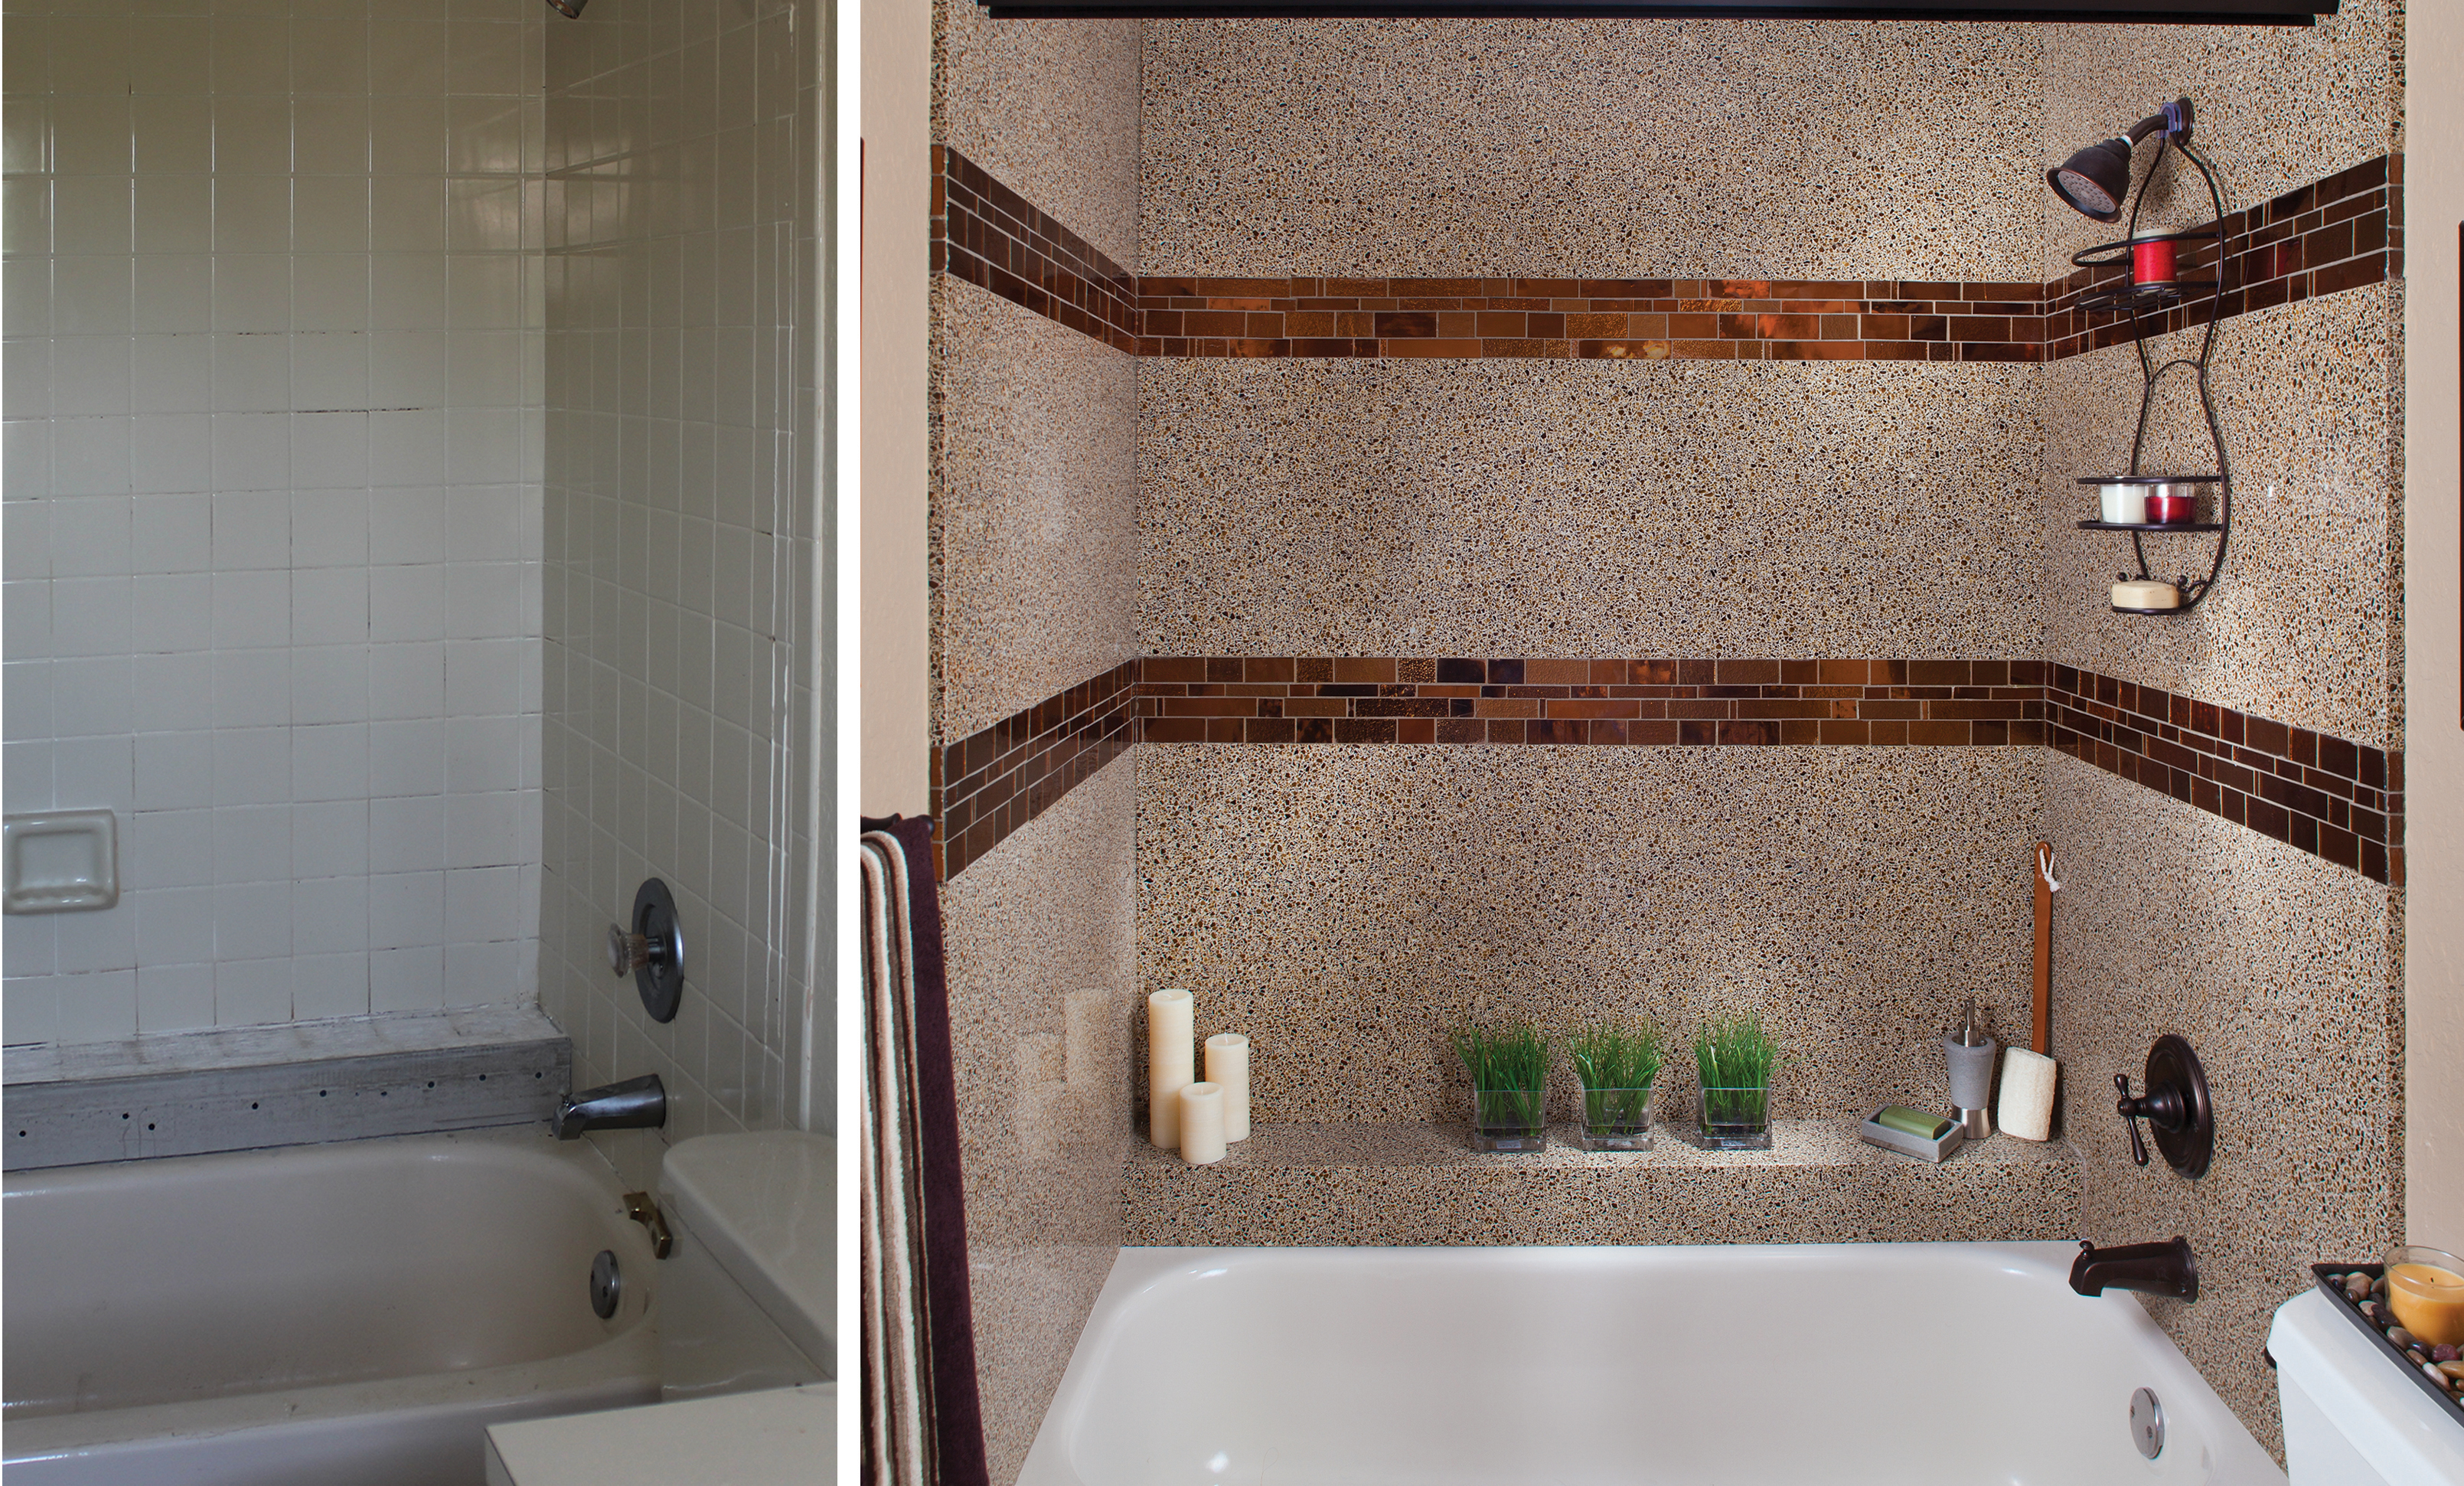 contractors ks inspiration ct appealing bathroom of trends manhattan remodeling contractor danbury local xfile u shocking birmingham and image kitchen al vanguard